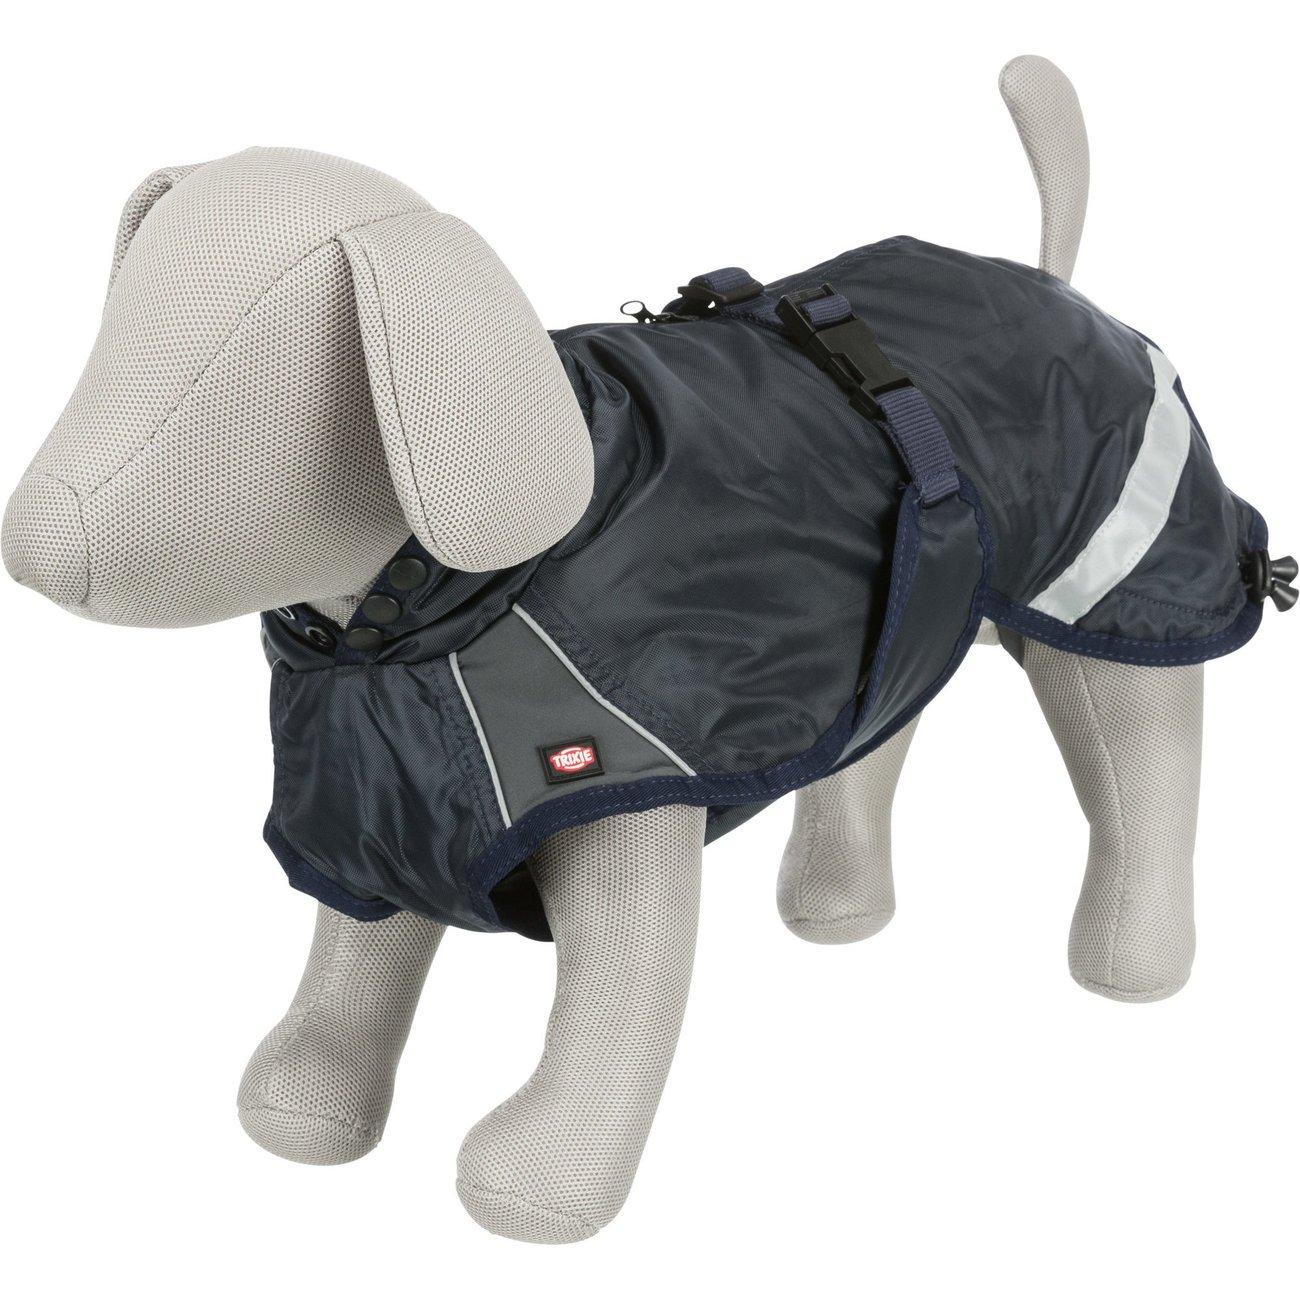 TRIXIE Hunde Wintermantel Rimont 67442, Bild 6